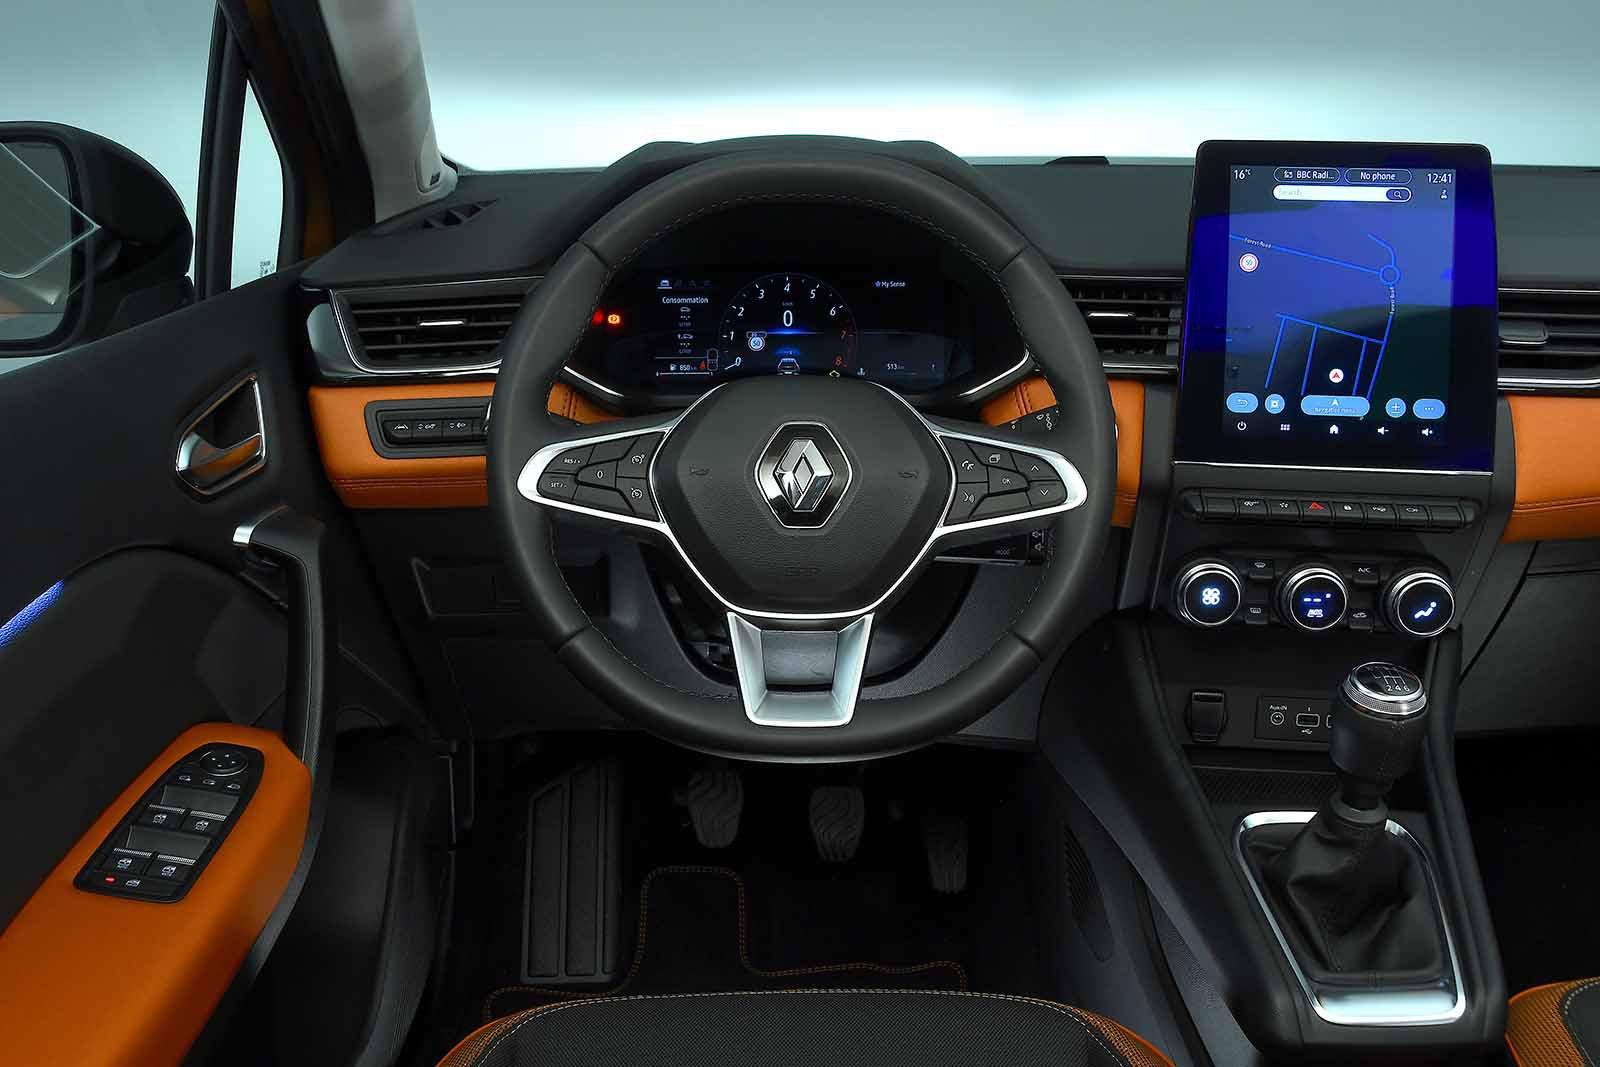 Renault Captur 2019 dashboard LHD